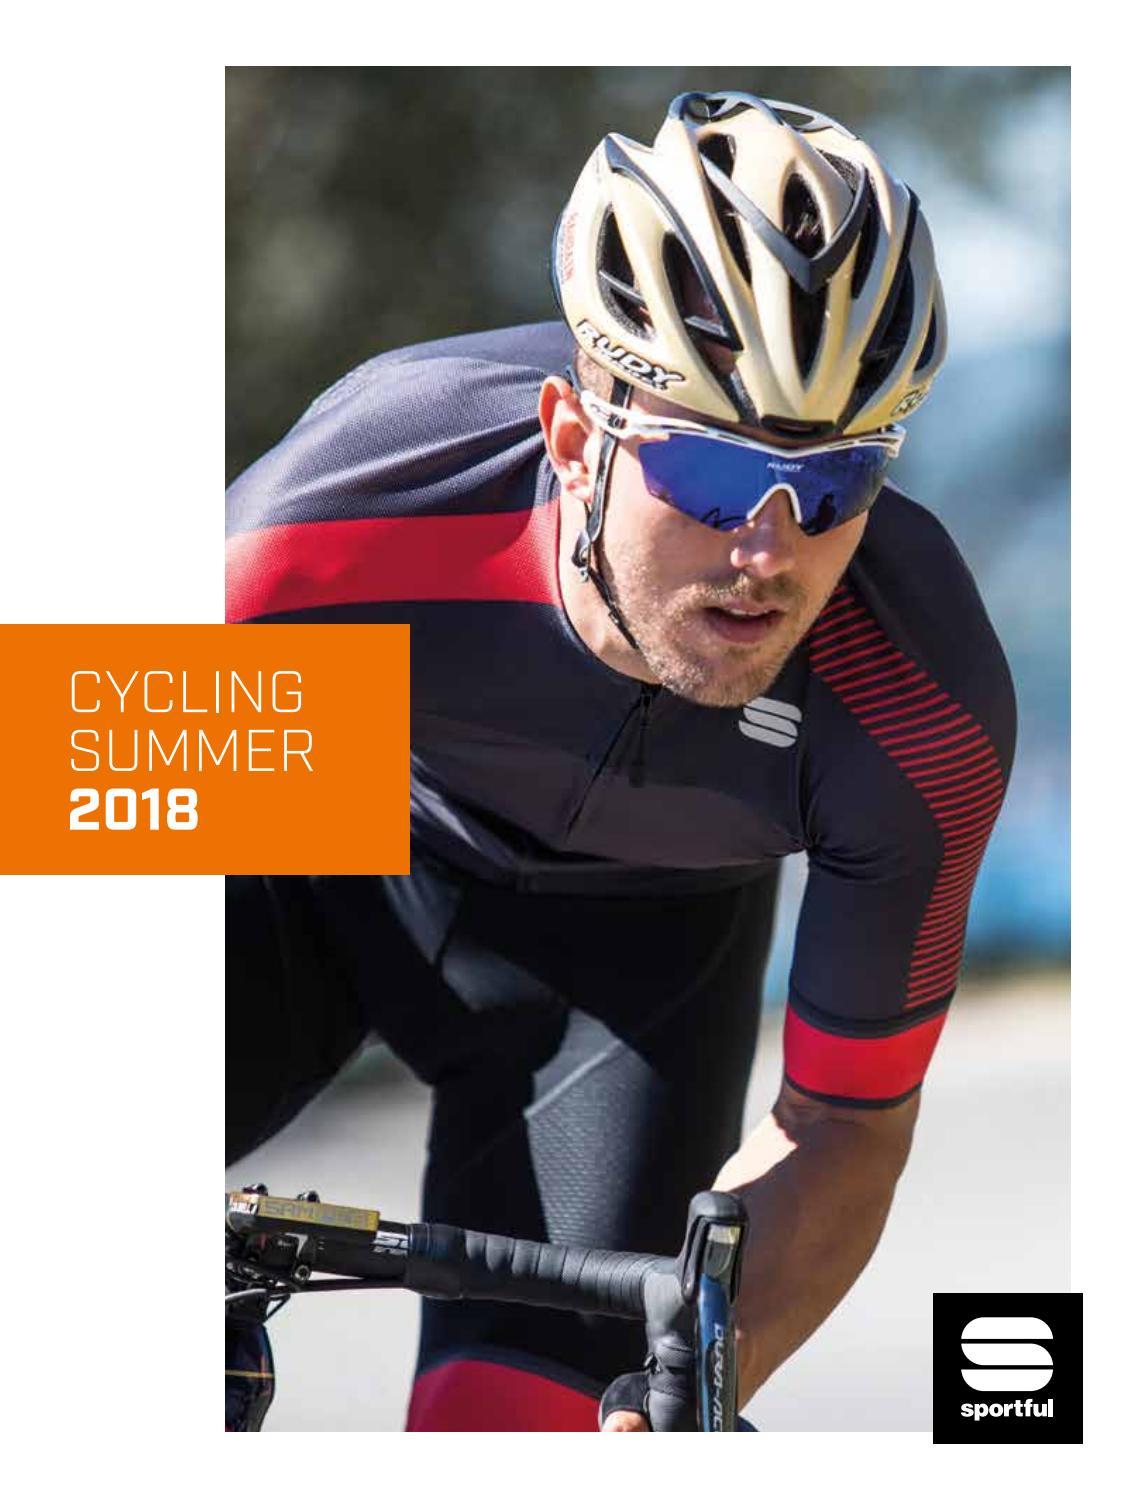 Bike Cycling Race Jersey Sportful Prism Short Sleeve Fabric Road Biking